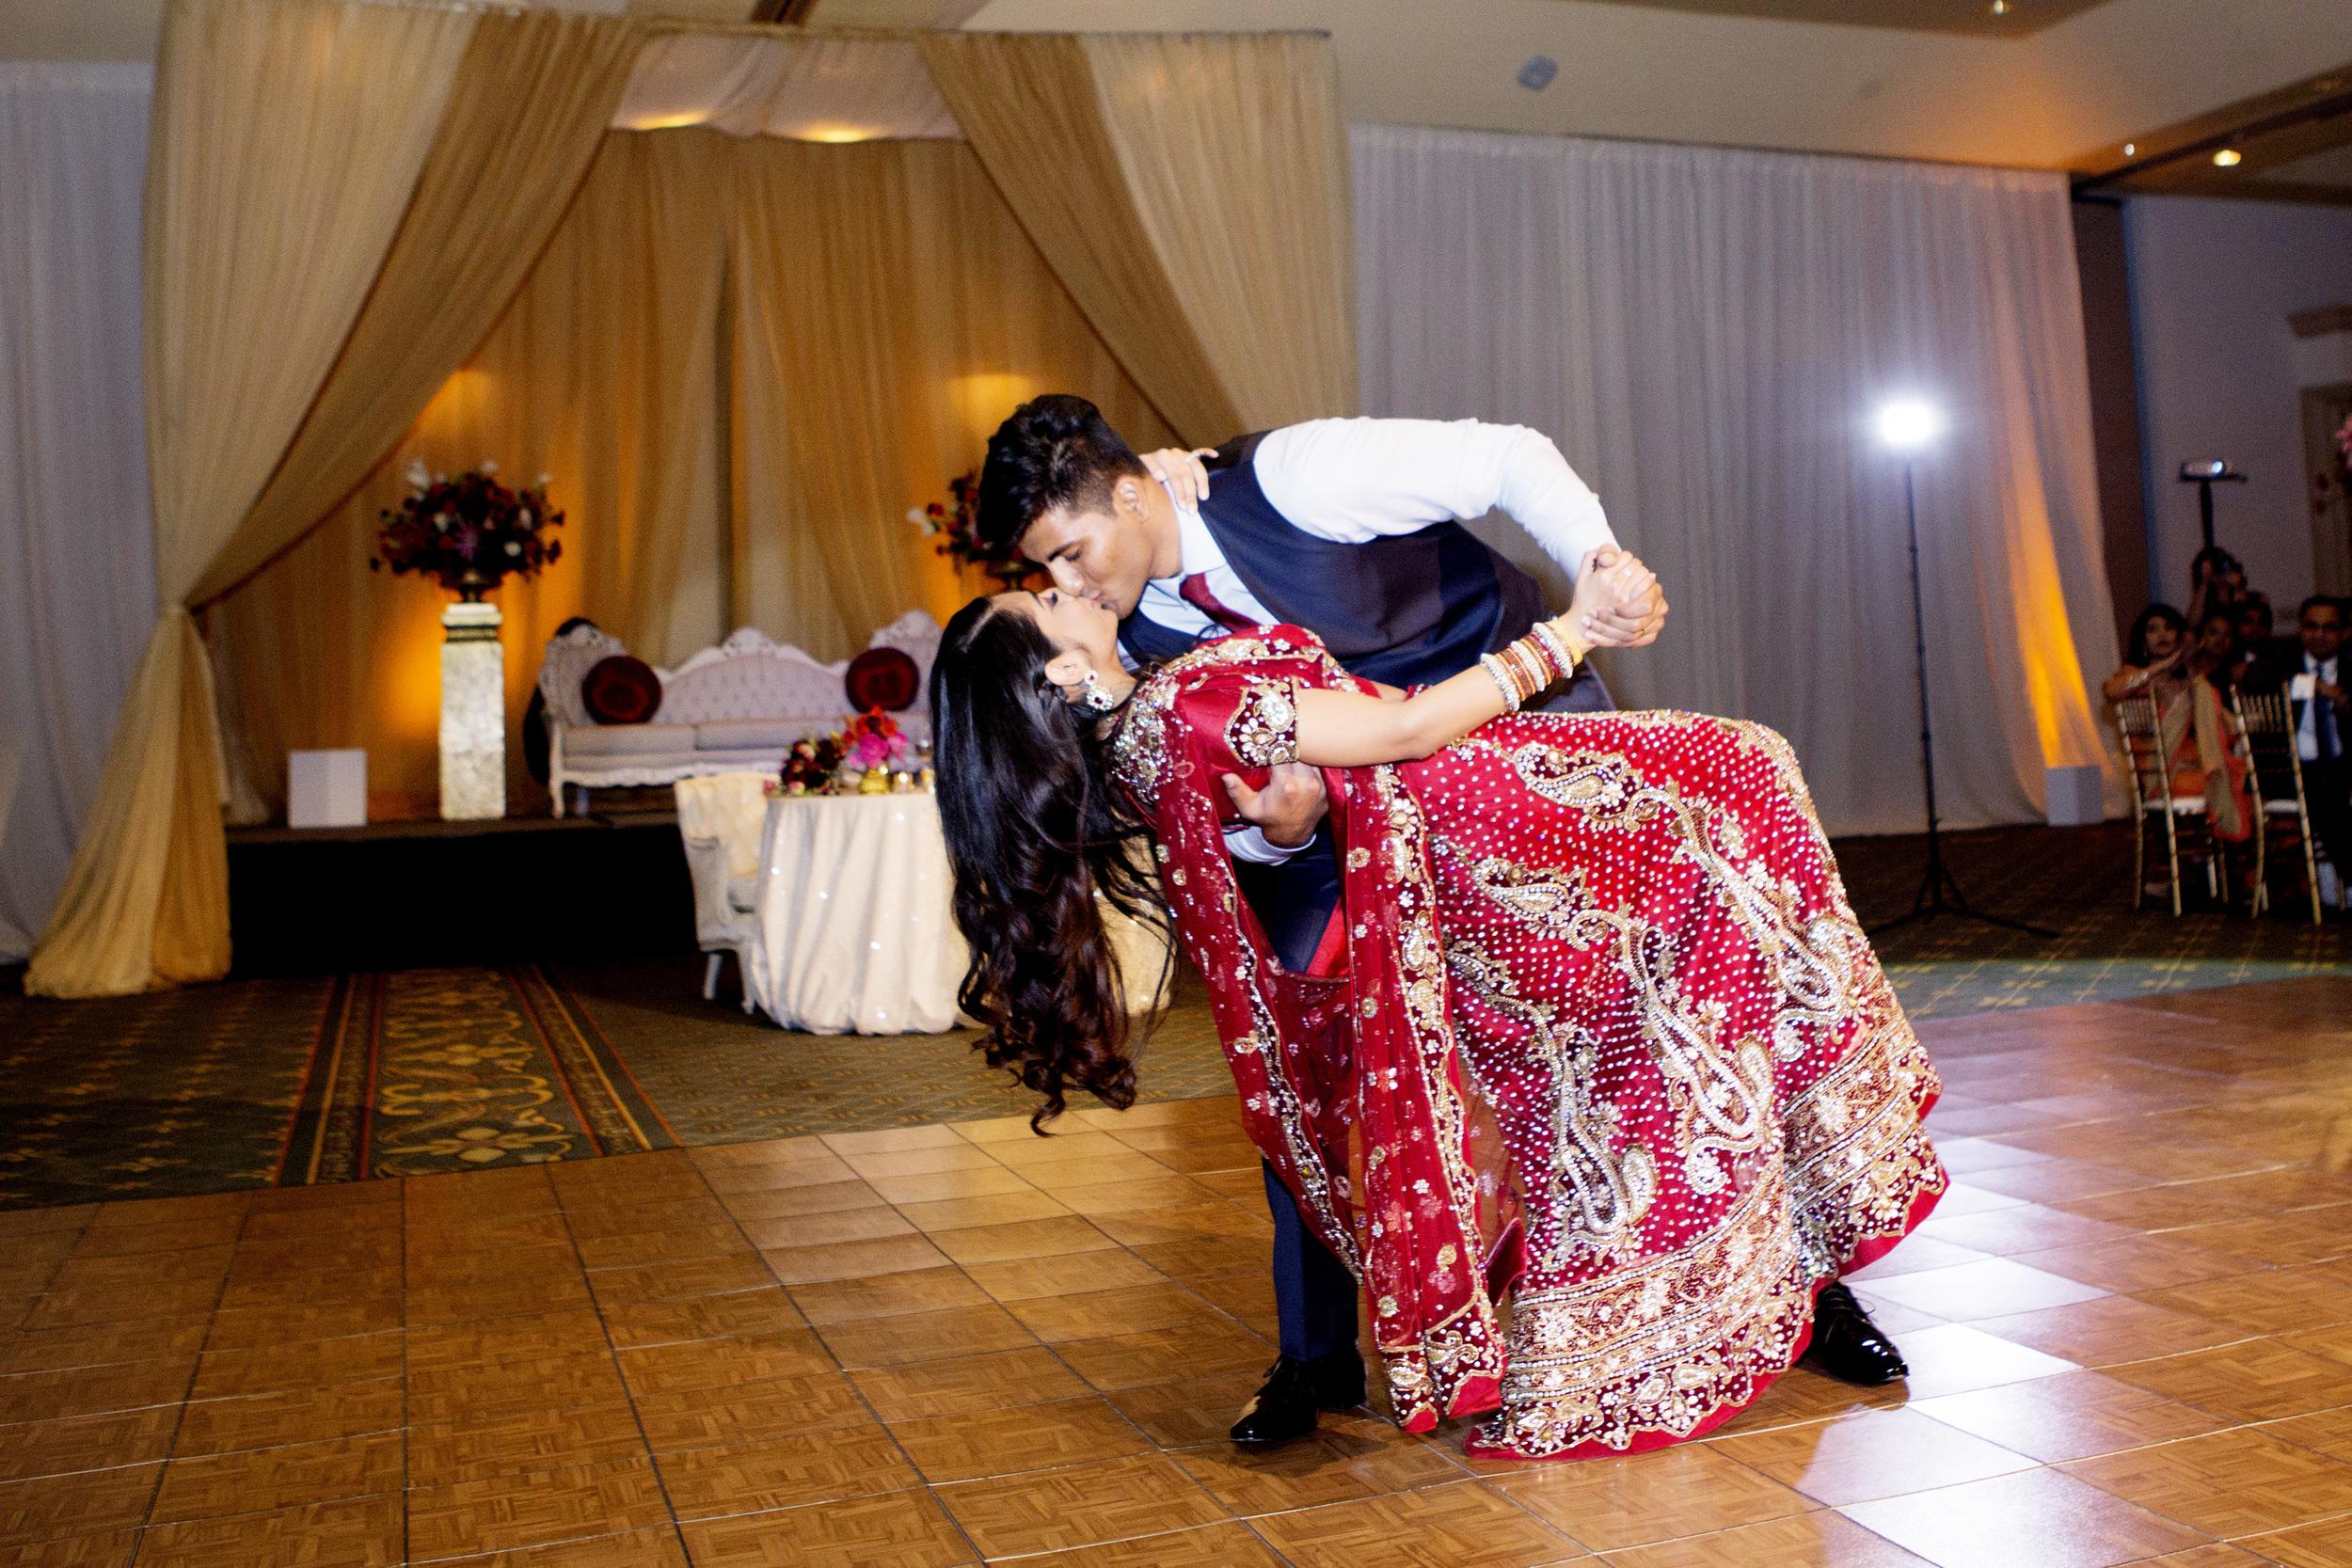 arizona wedding, wedding planner, scottsdale wedding planner, destination wedding planner, phoenix wedding planner, wedding coordinator, event planner, wedding design, indian wedding